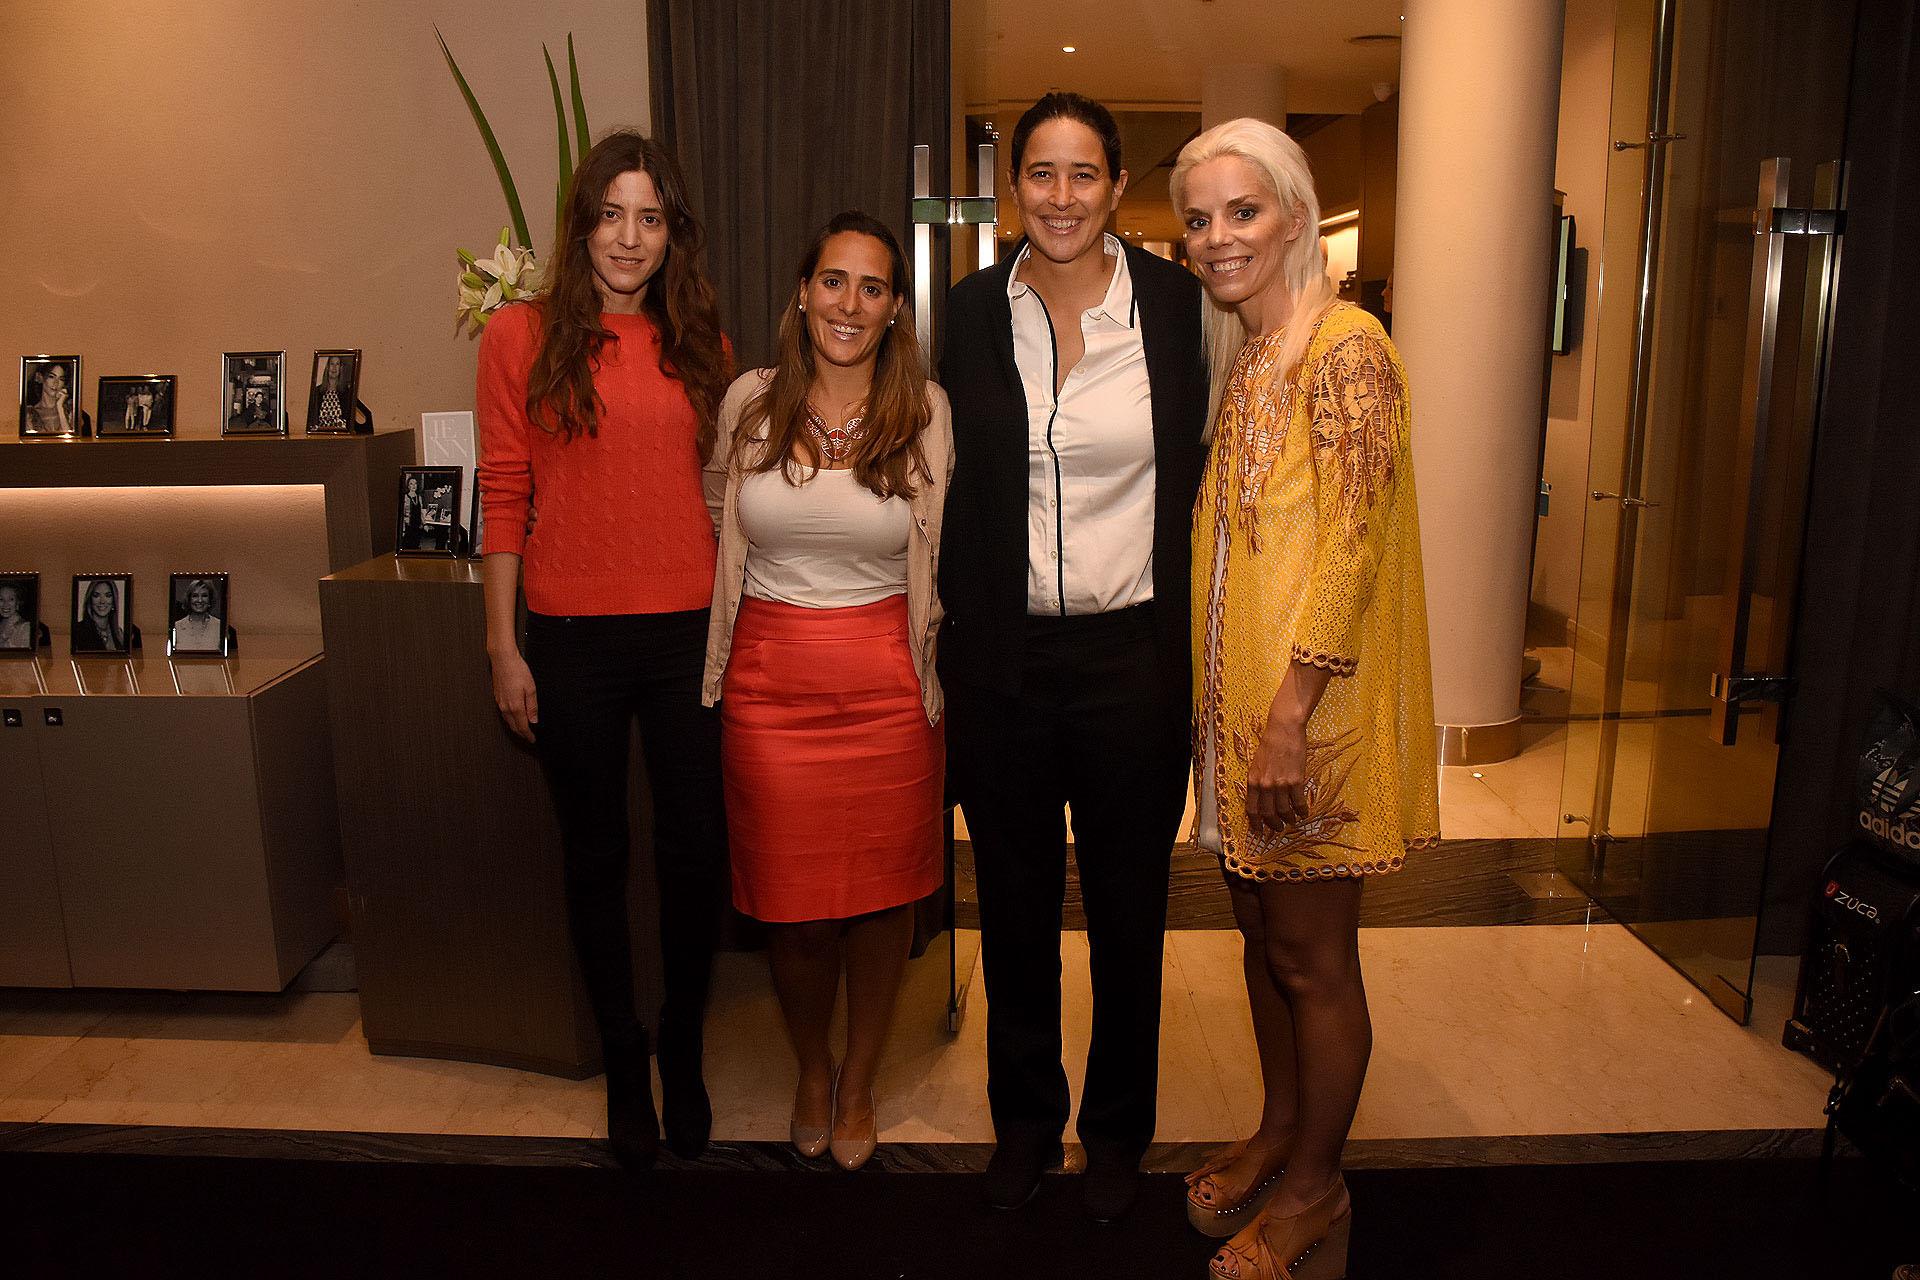 Manuela Rattazzi -hermana de Alexia-; Teresita Ormaechea -responsable de relaciones institucionales de PANAACEA; Alexia Rattazzi y Agustina Rossi